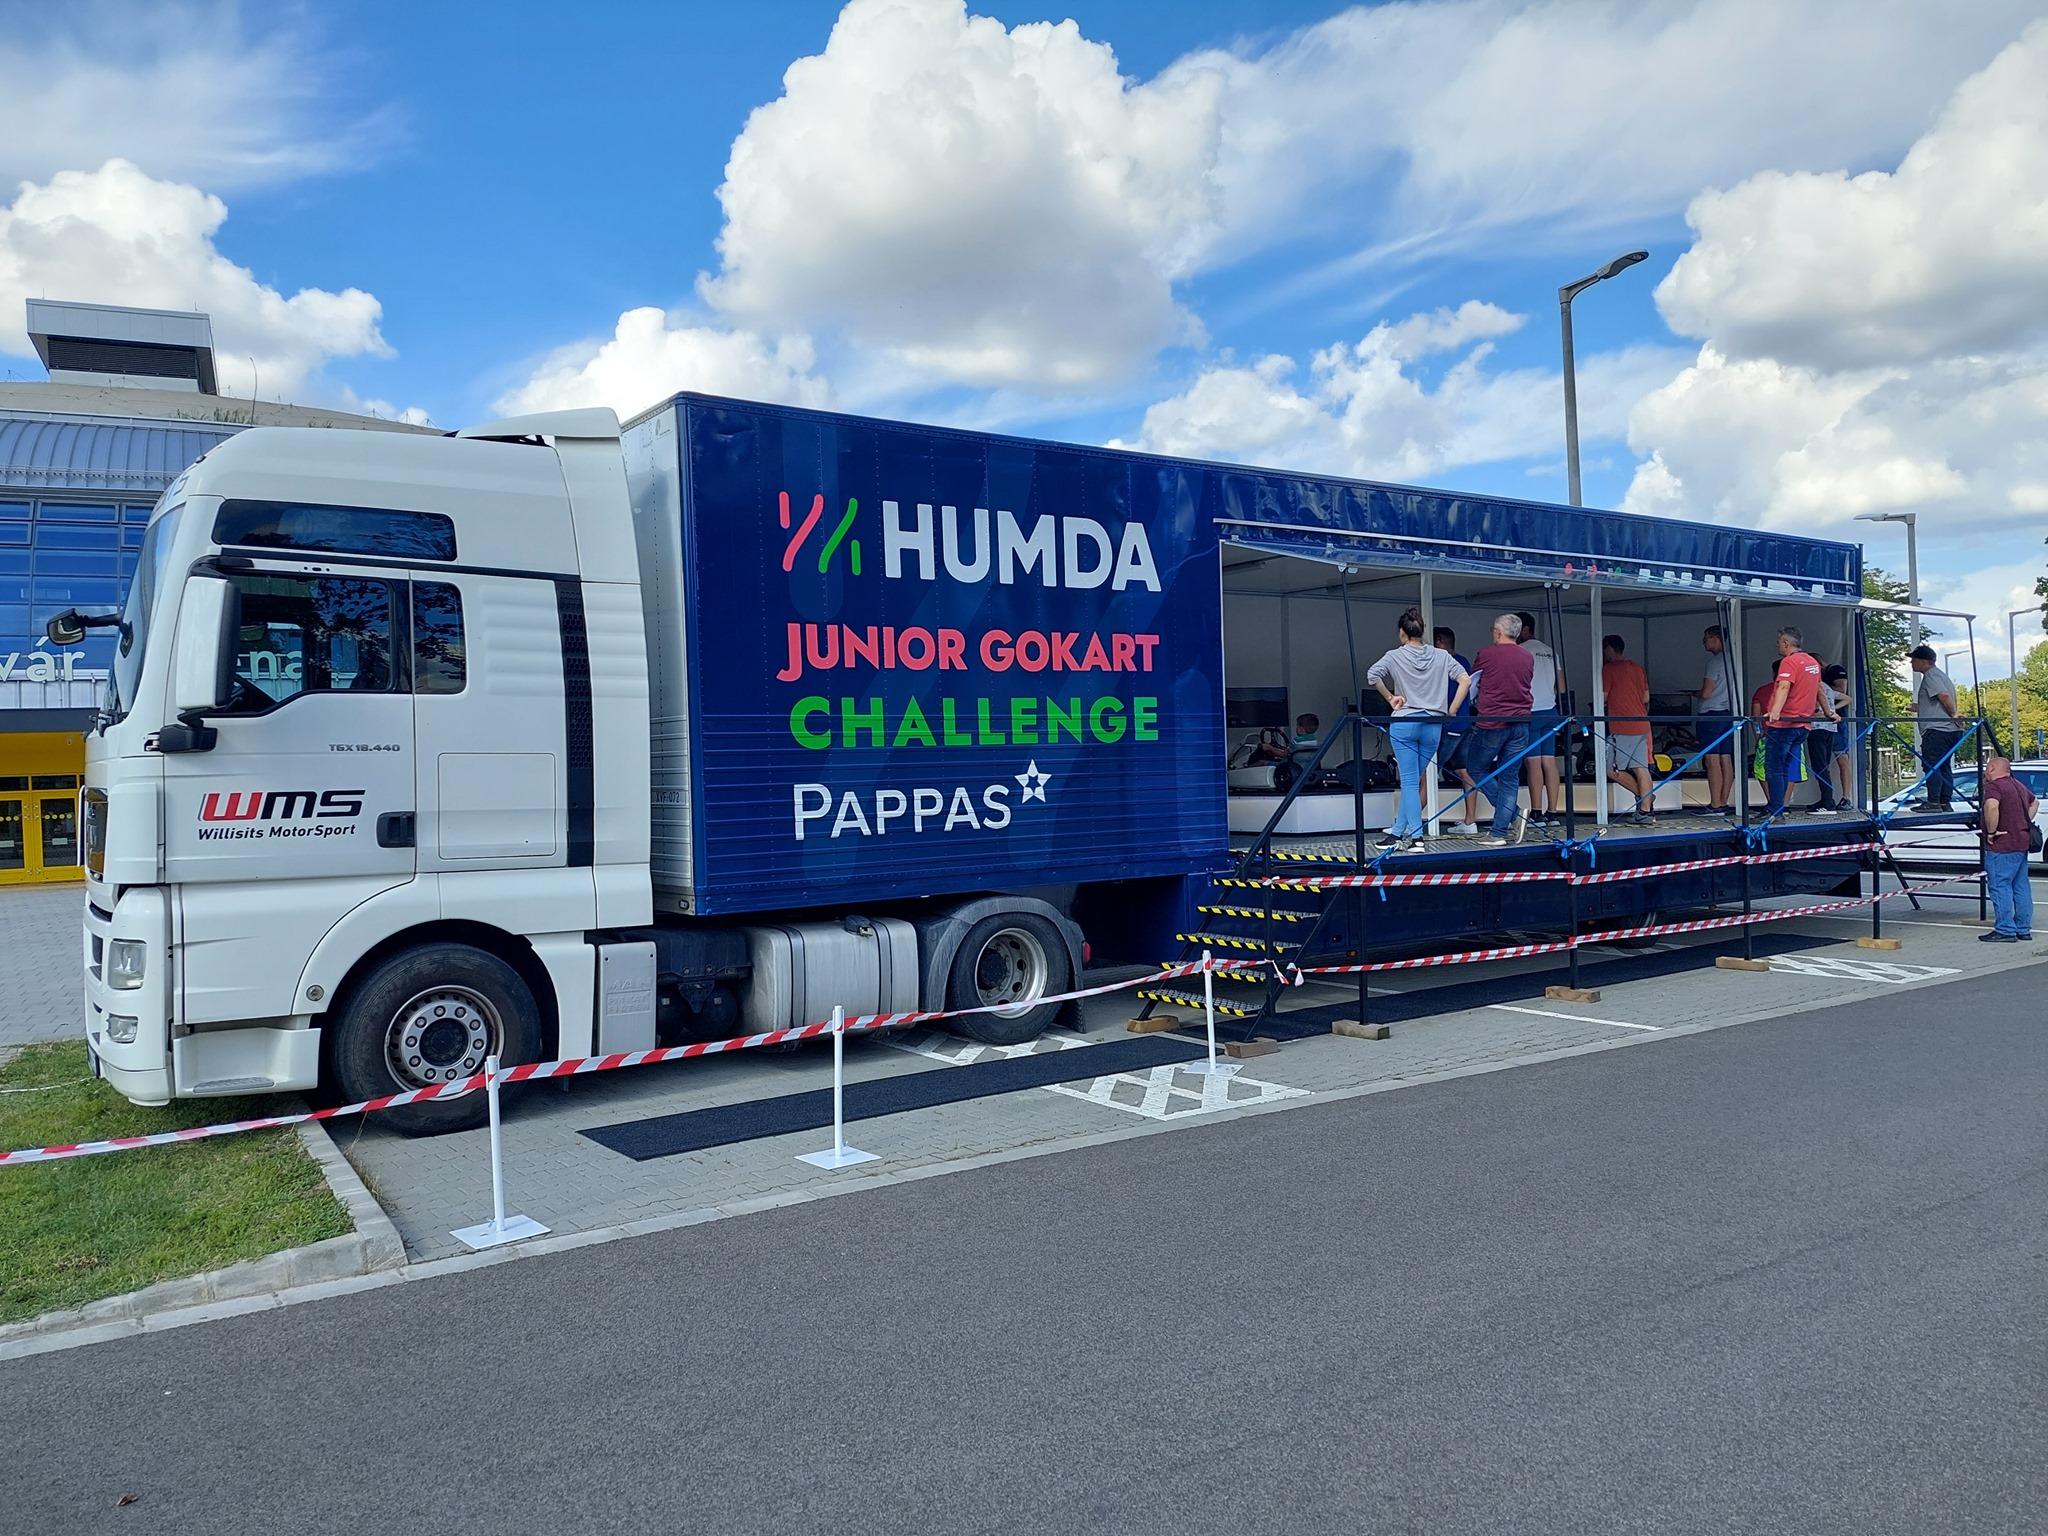 Kaposvár – HUMDA Junior Gokart Challenge